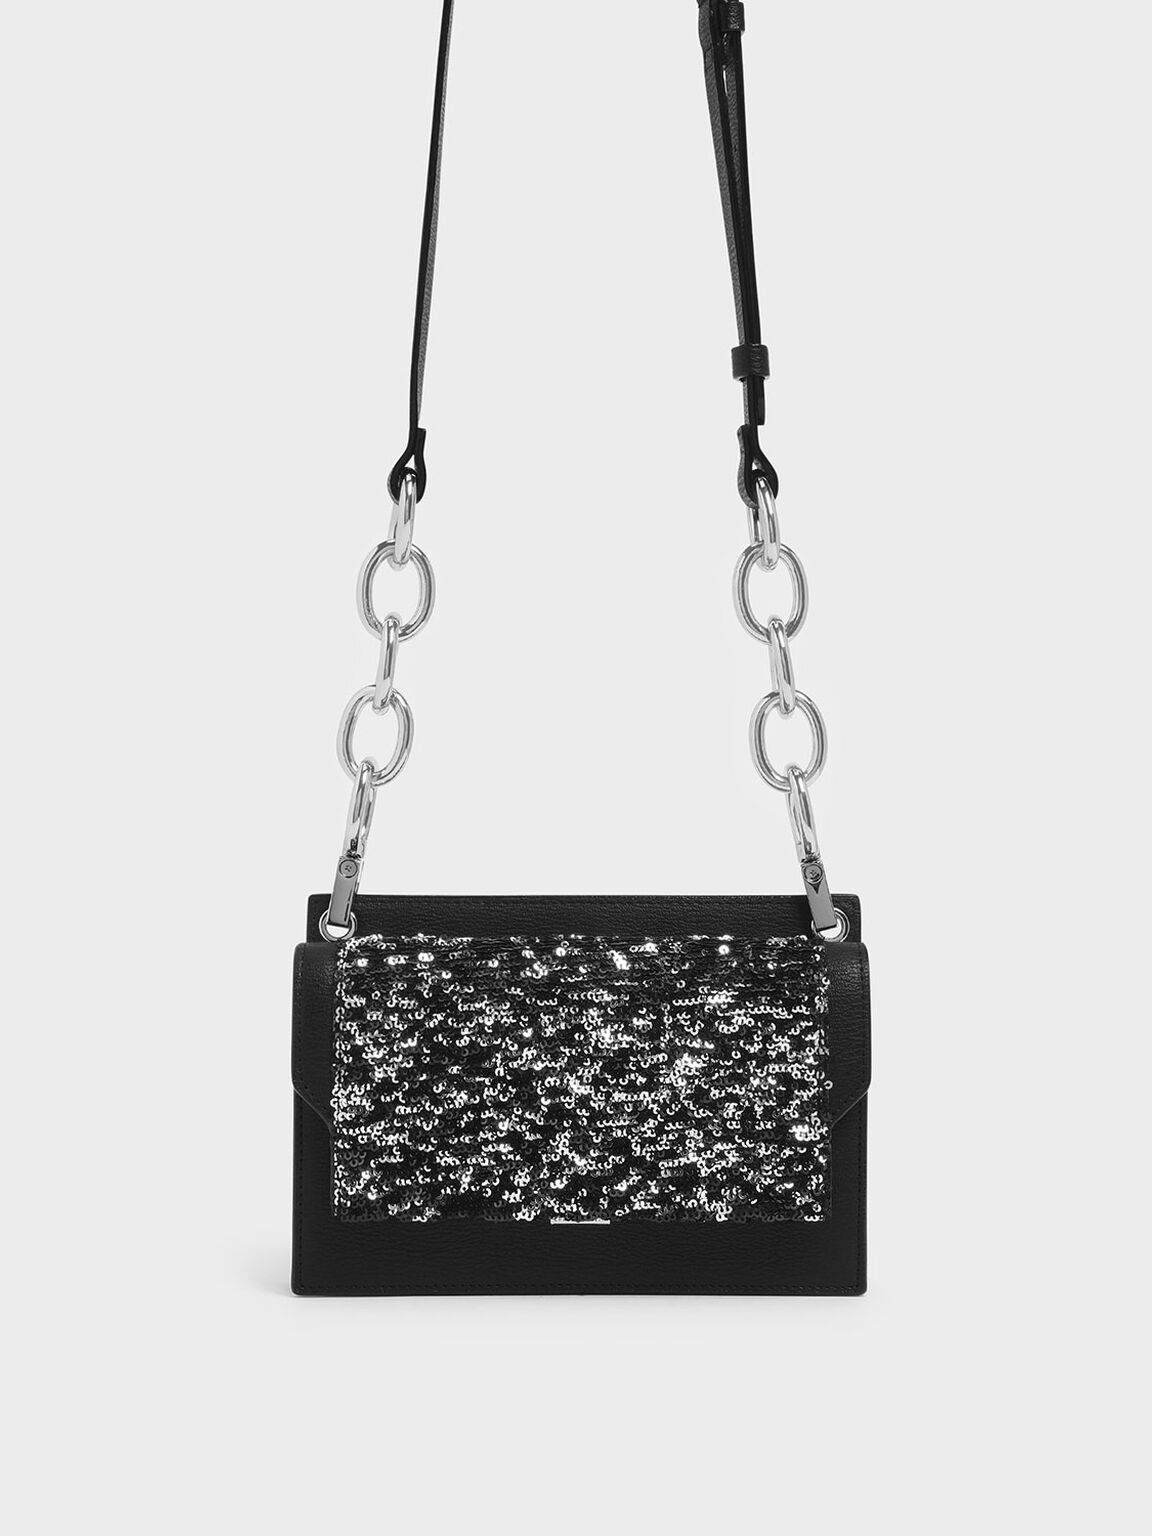 Eyelet Embossed Sequin Push Lock Clutch, Black Textured, hi-res